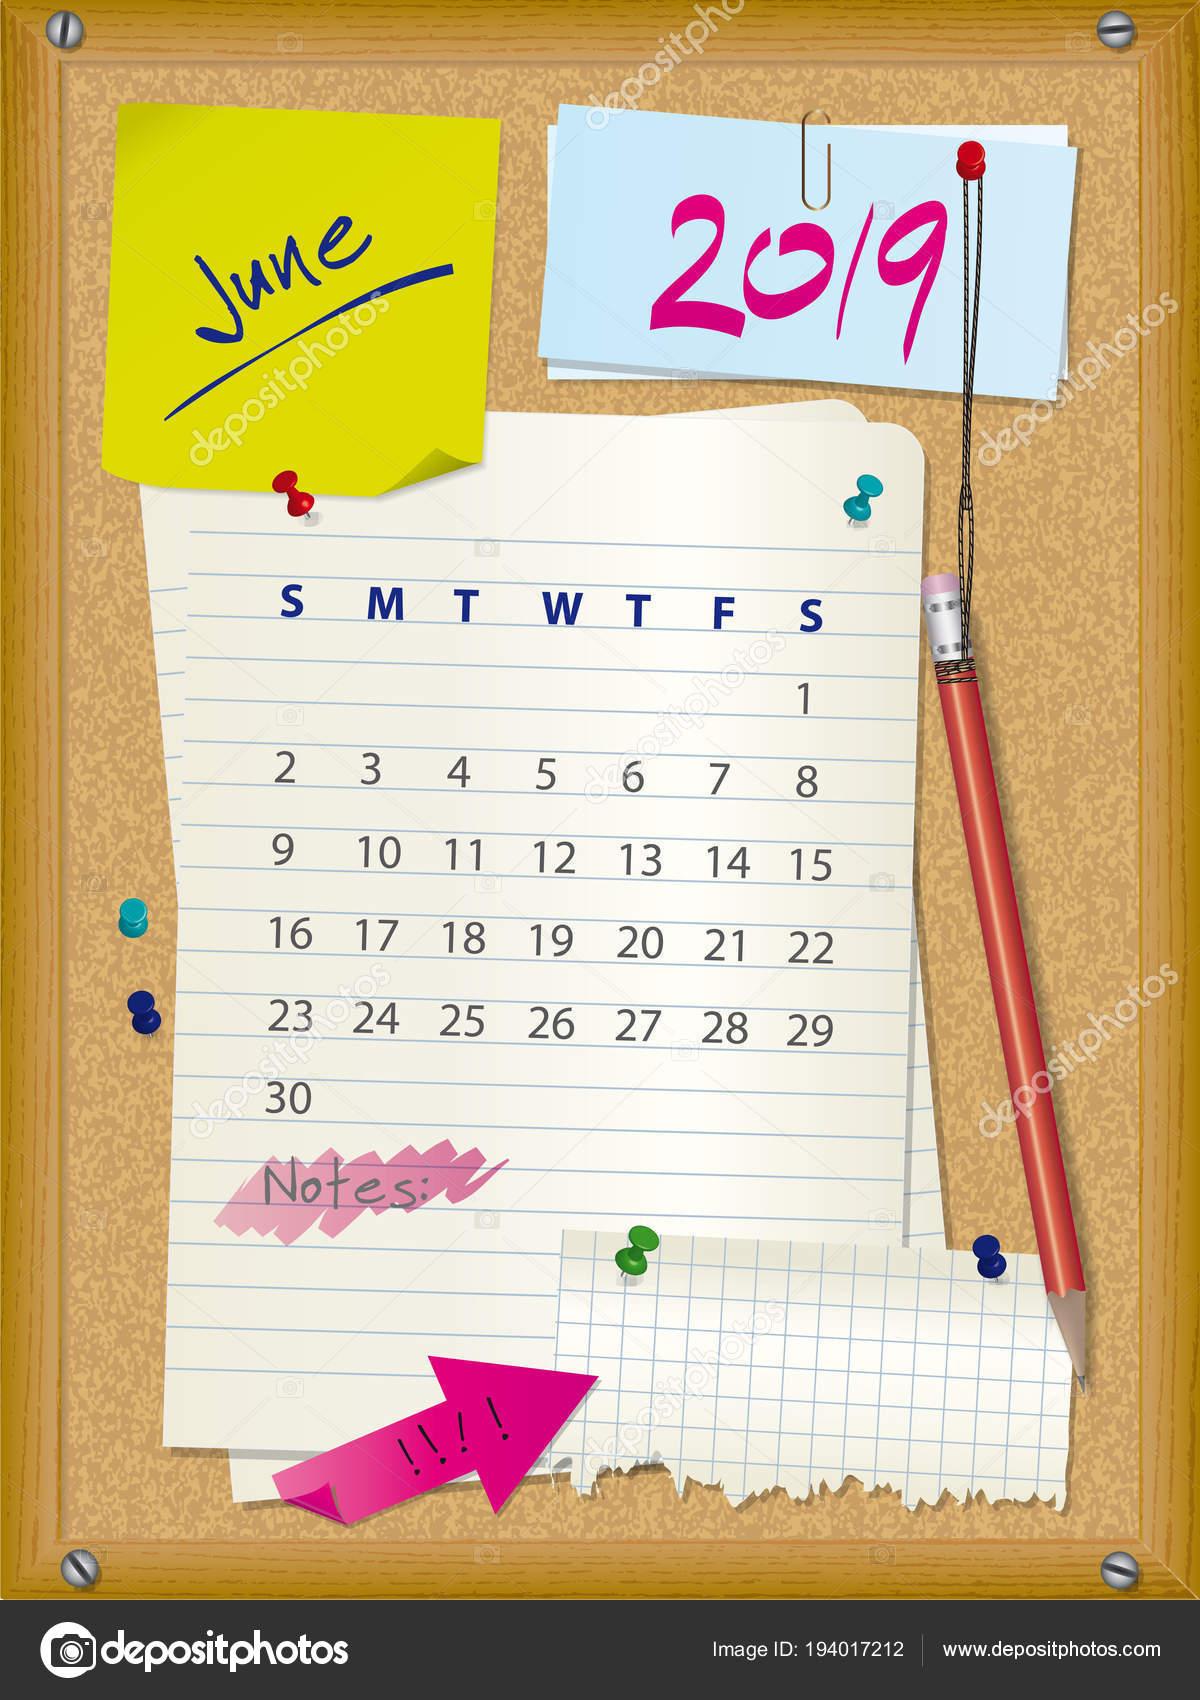 2019 naptár június 2019 naptár   június hónapban   parafa fórumon jegyzetek — Stock  2019 naptár június